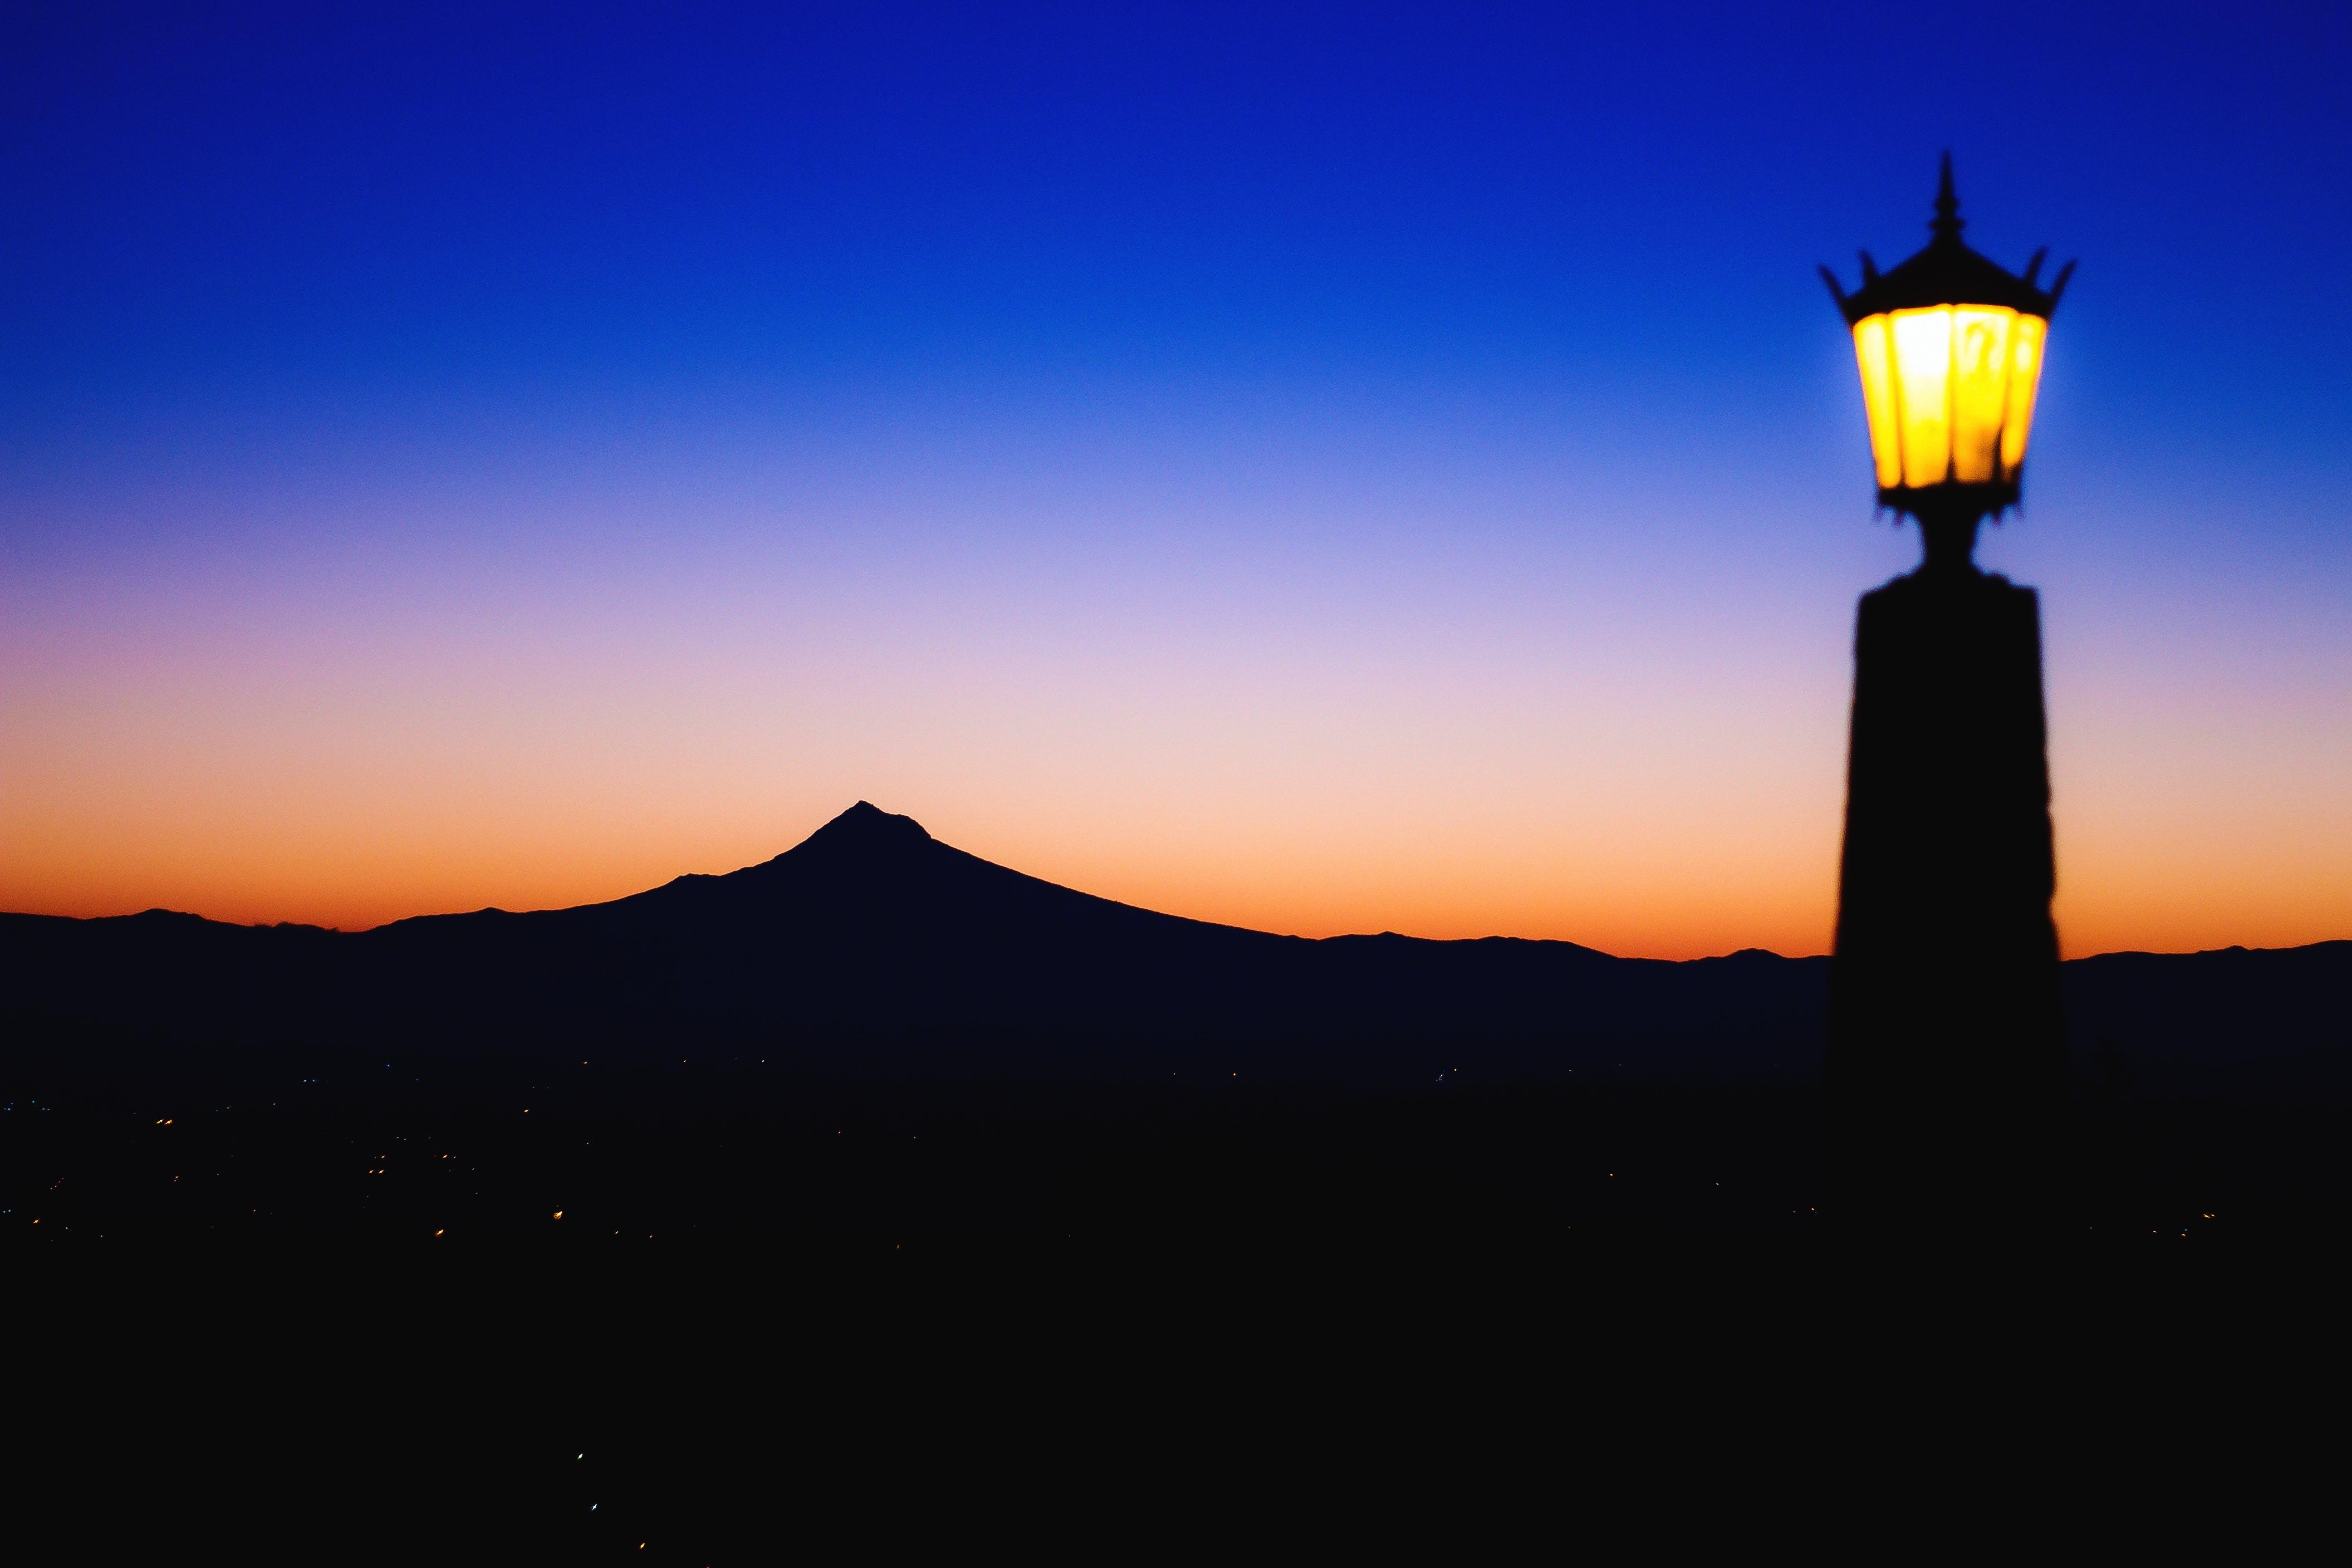 Free stock photo of light, blue, sunrise, yellow